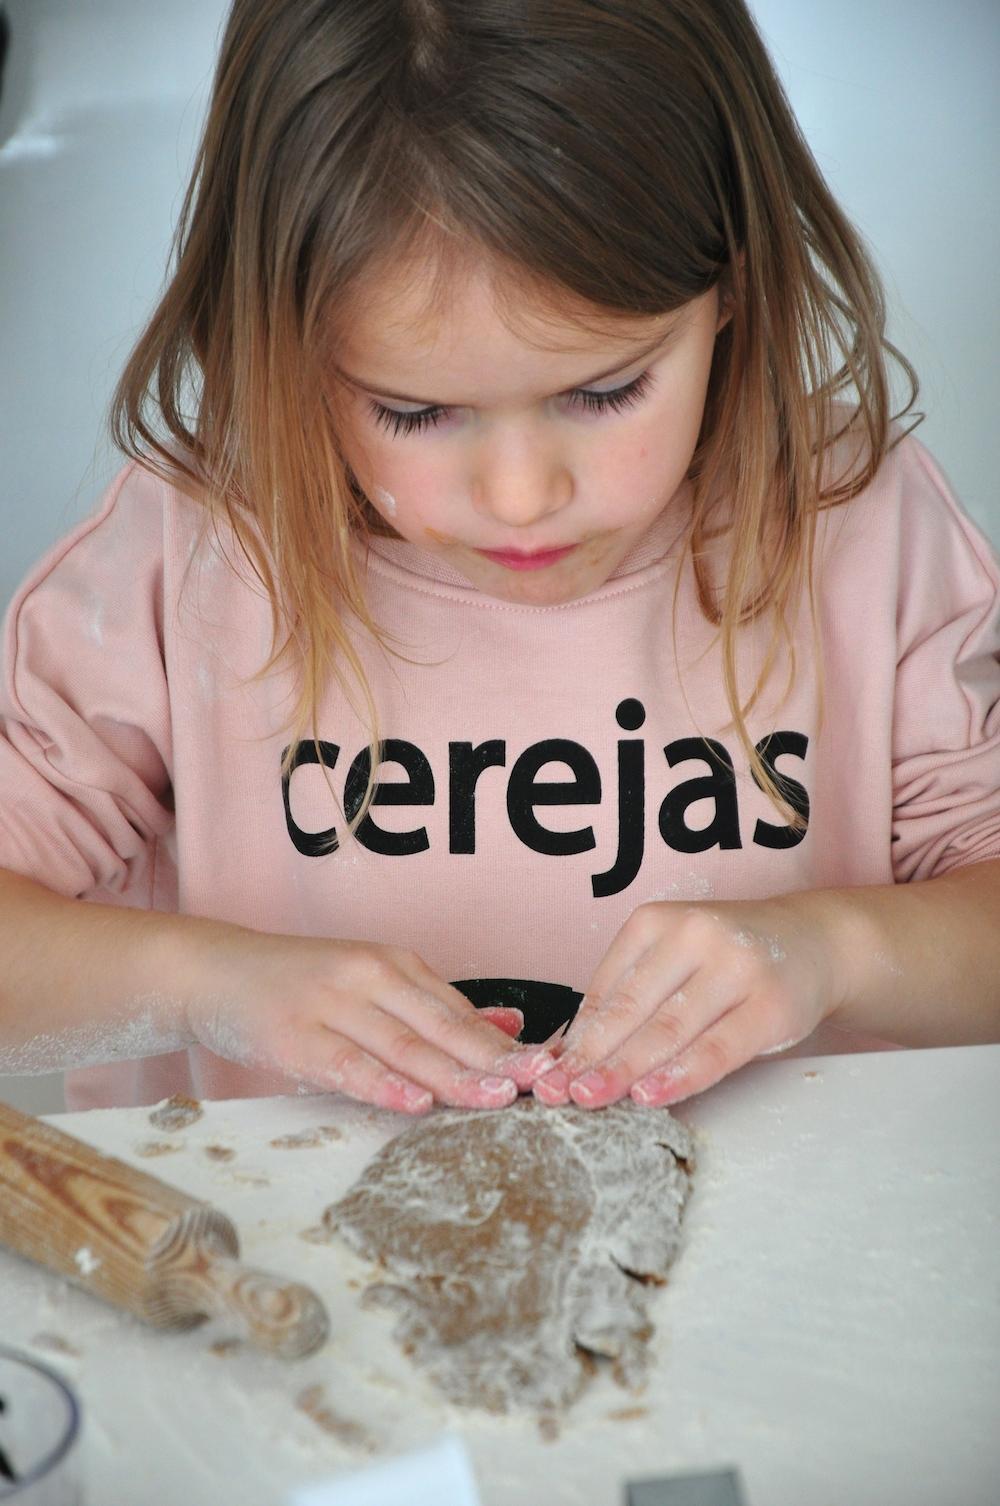 Hugo_loves_tiki_cherries_cerejas_baking_chloeuberkid